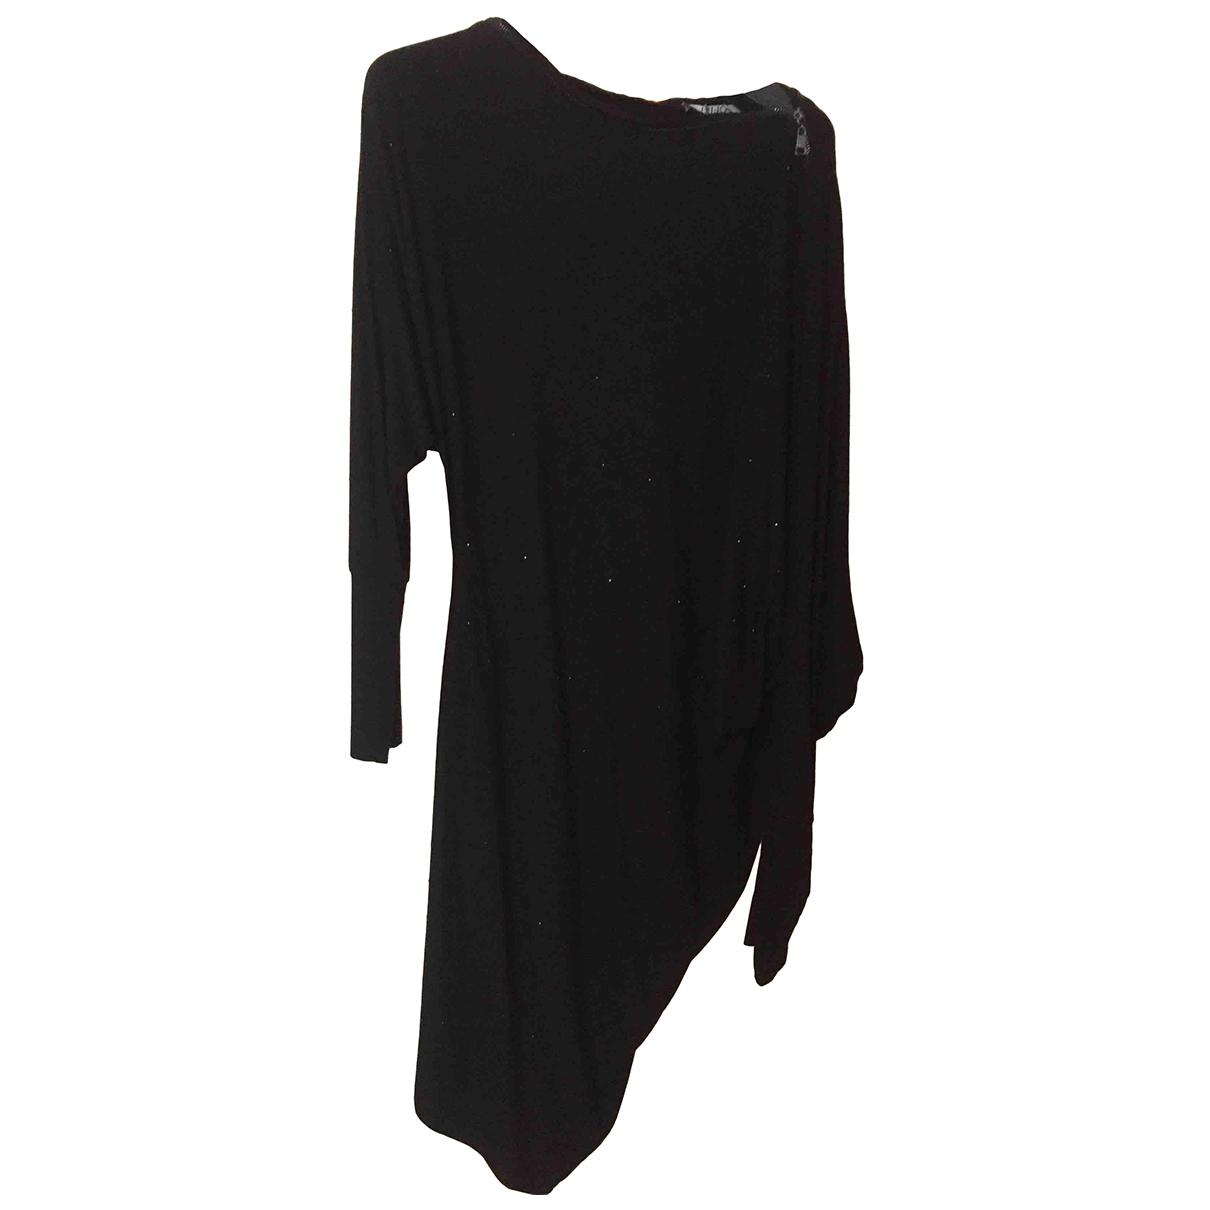 Liu.jo - Robe   pour femme en coton - elasthane - noir